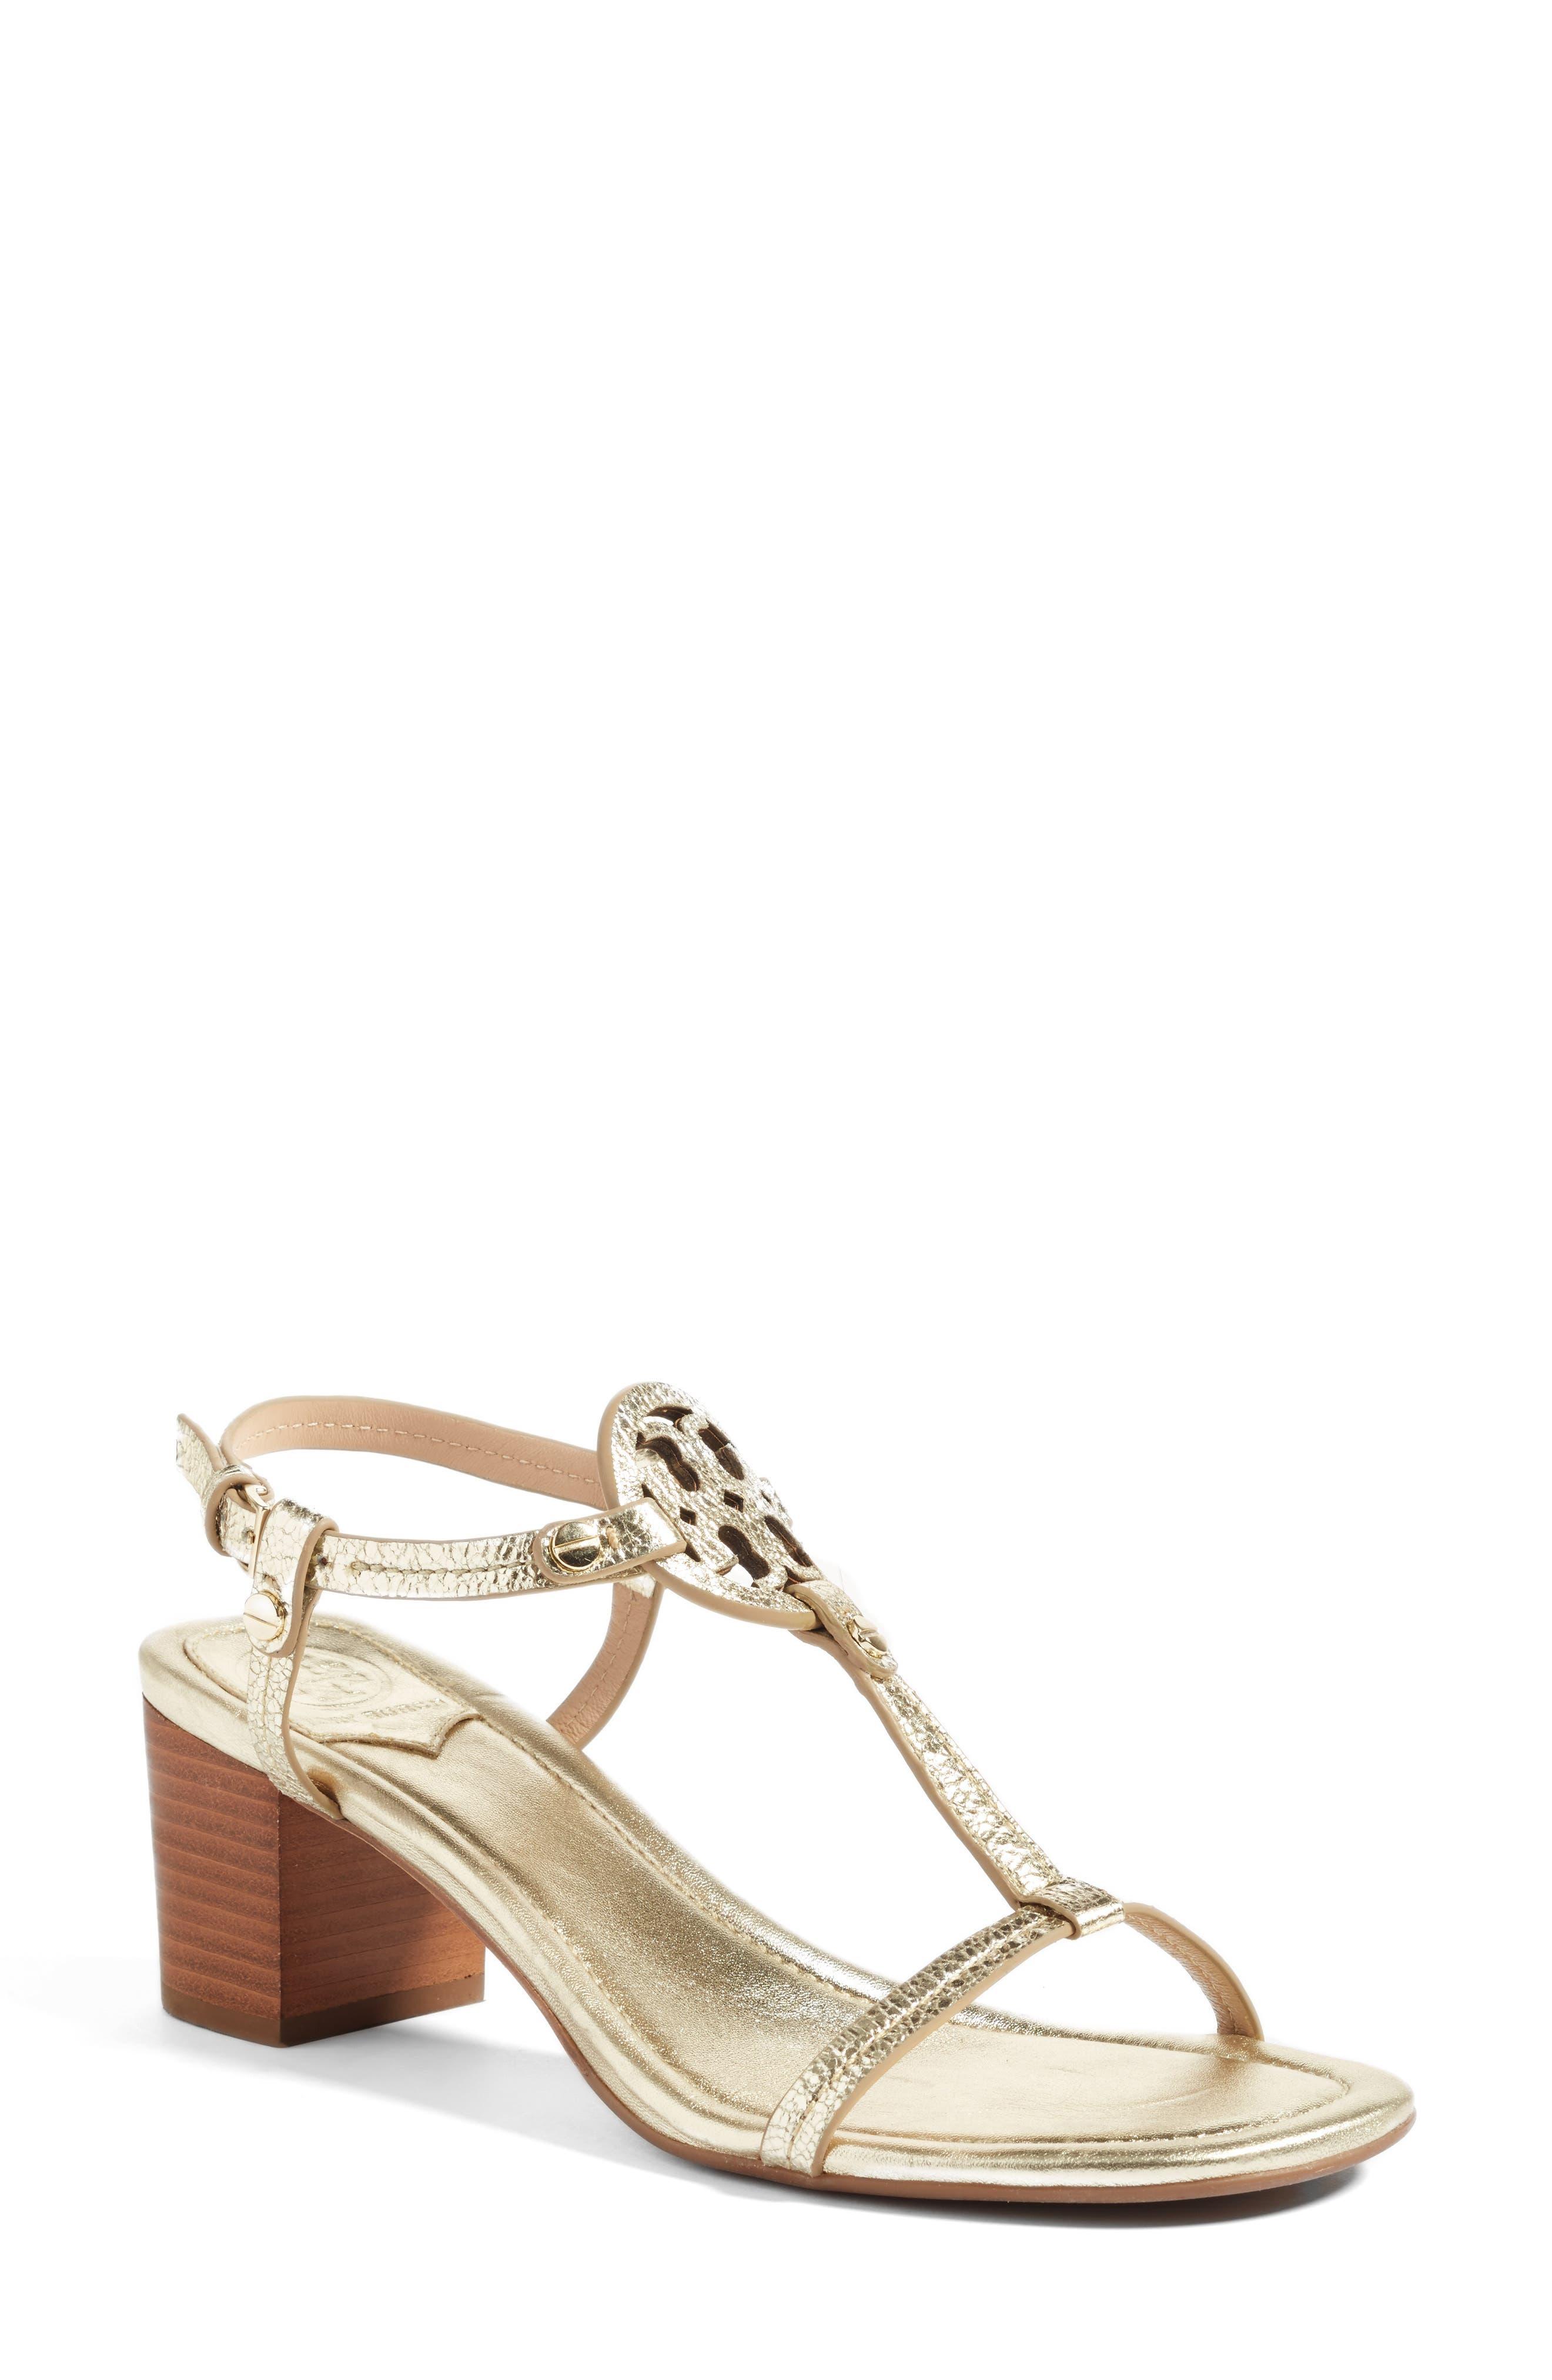 Main Image - Tory Burch Miller Block Heel Sandal (Women)